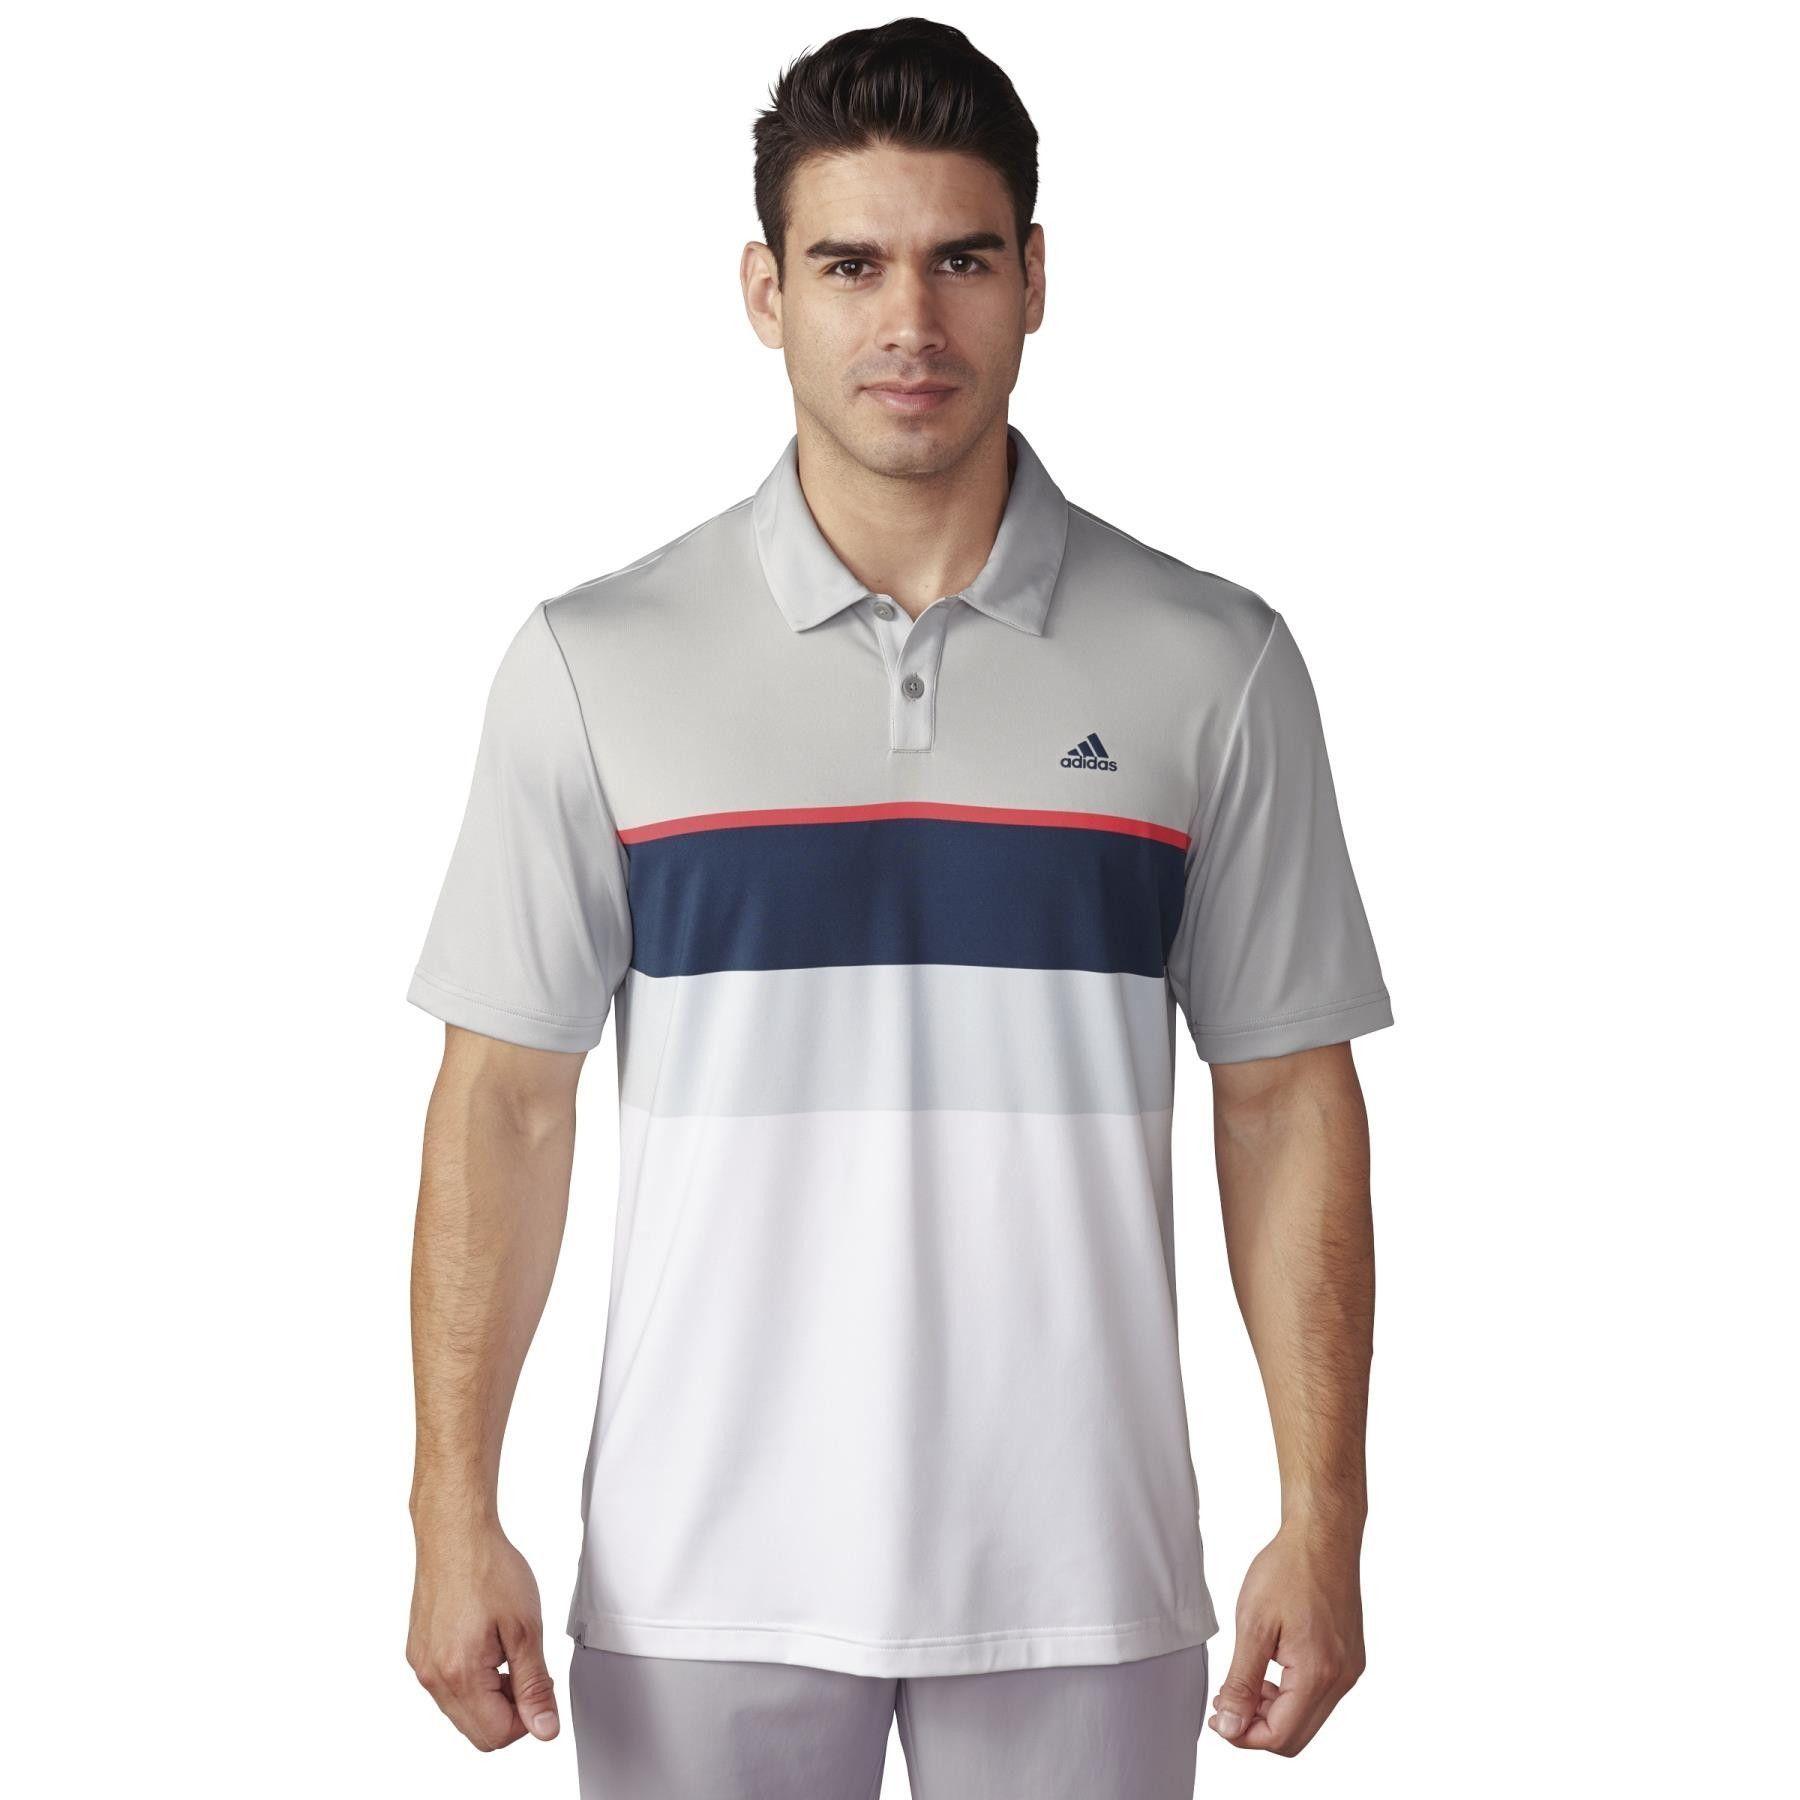 cheaper b27e5 256c0 Adidas Golf Shirts Engineered Striped Polo